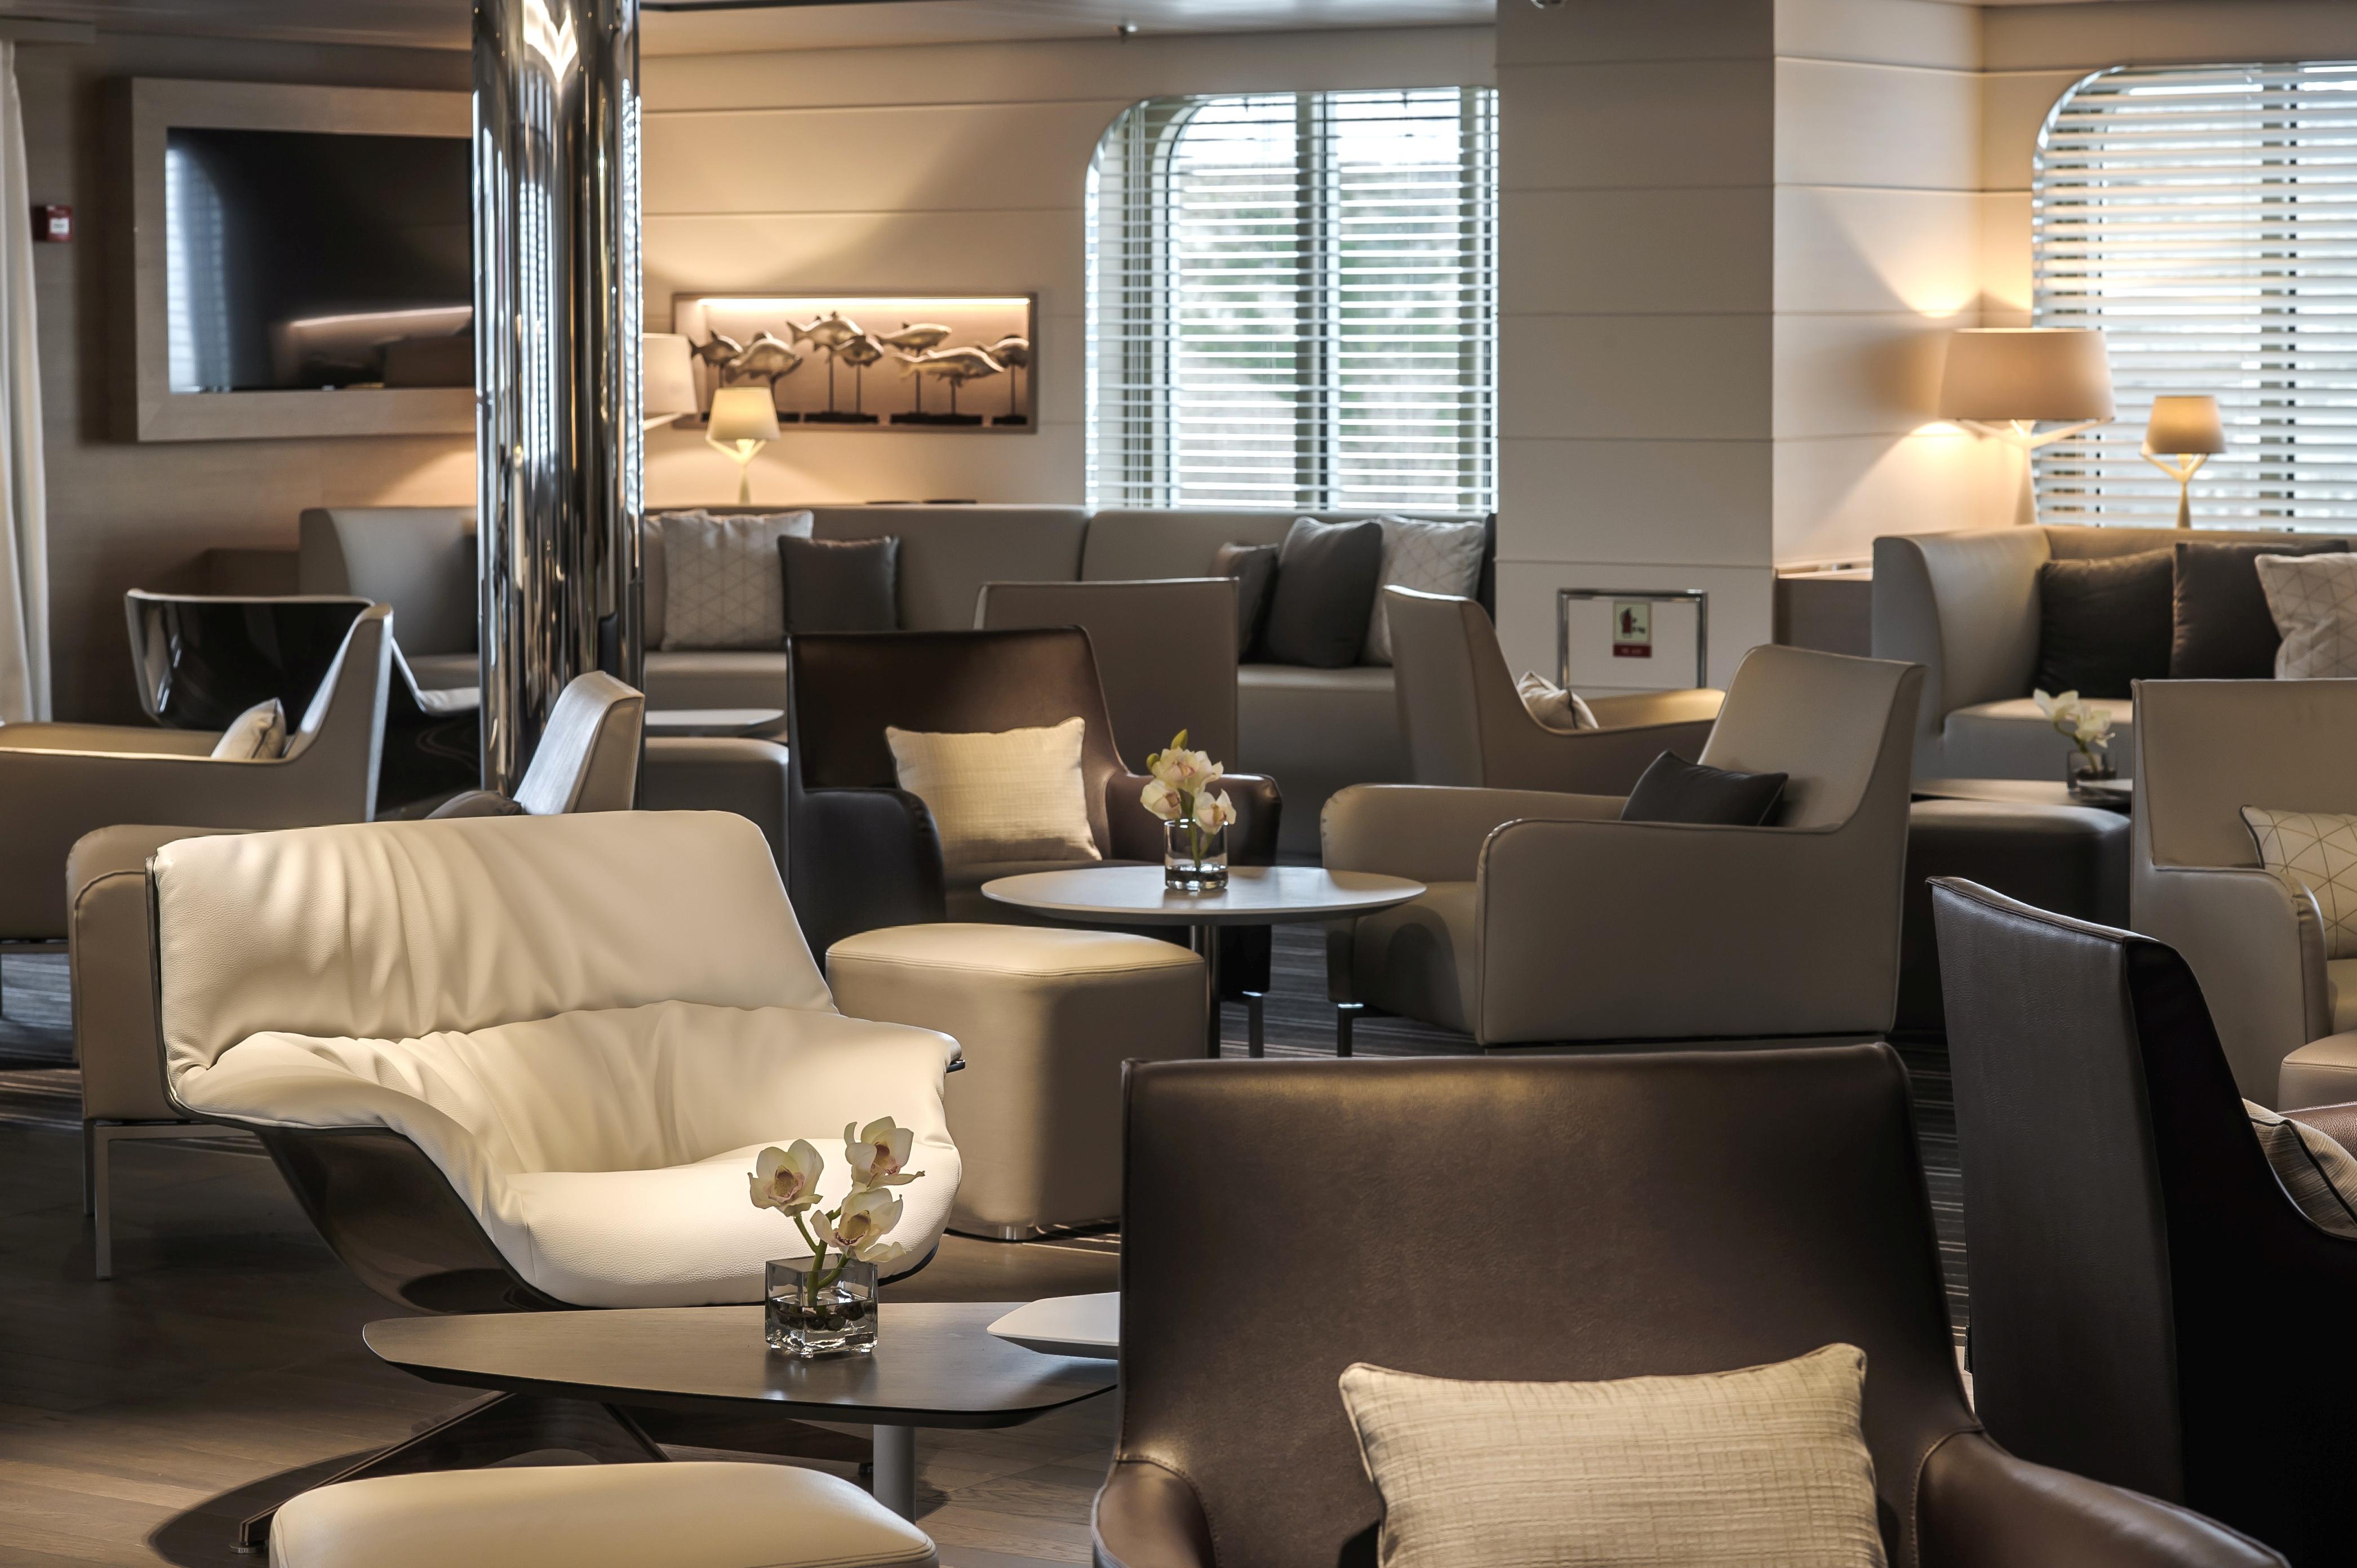 Ponant Le Soleal Interior Main Lounge 2.JPEG